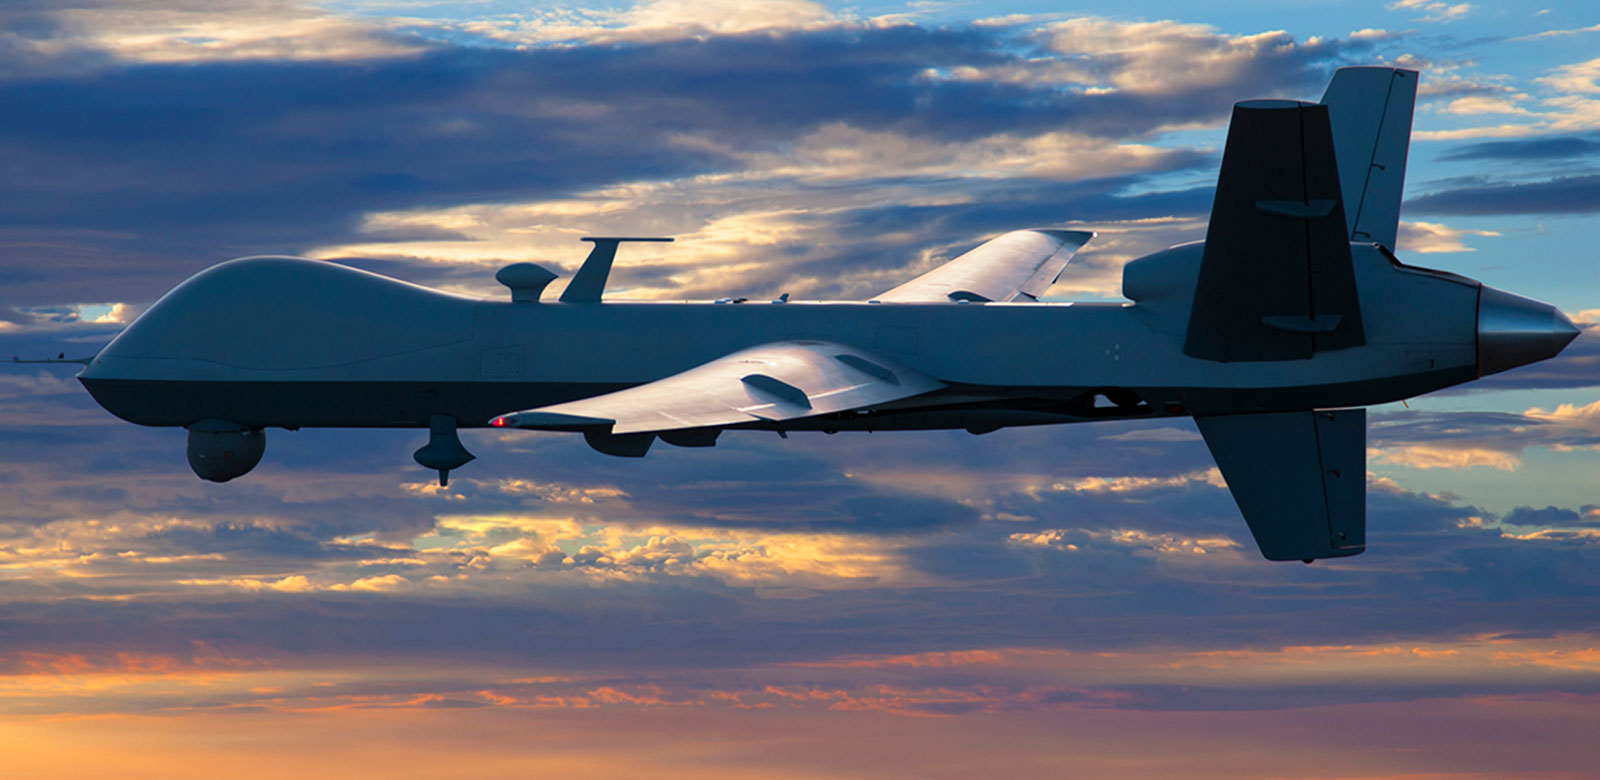 MQ-9A Reaper (Predator B) | General Atomics Aeronautical Systems Inc.